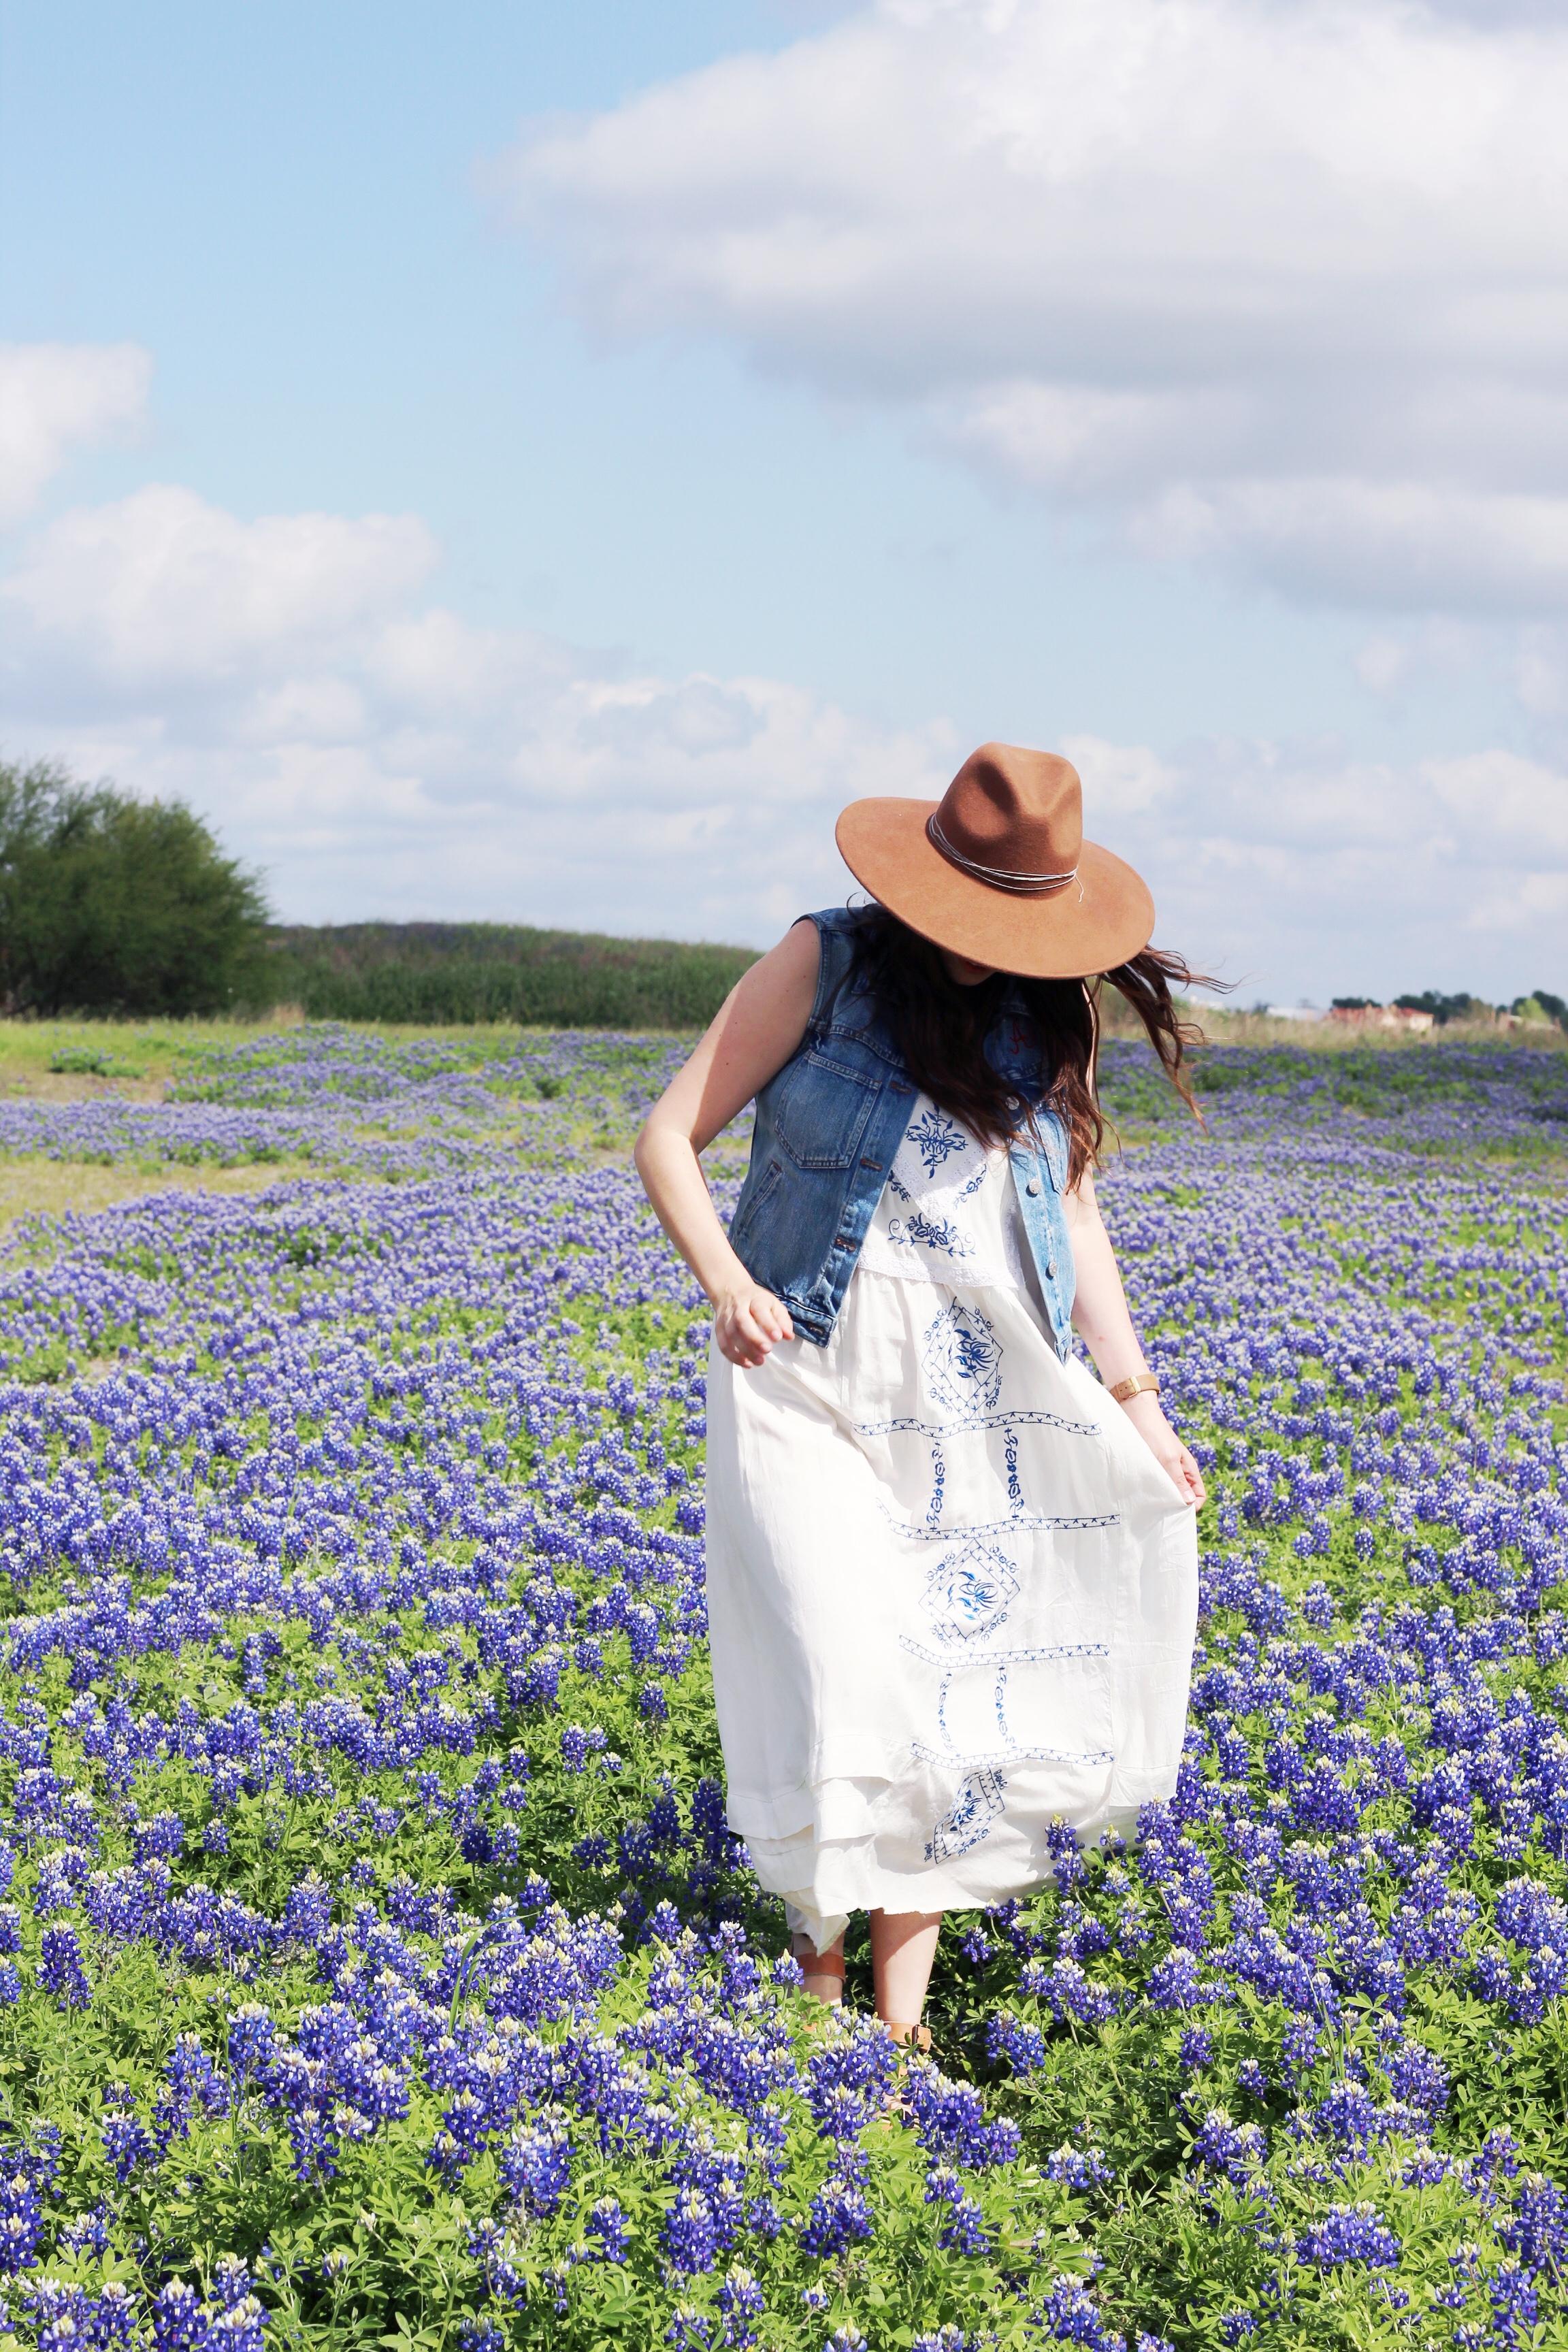 Where to take blue bonnet pictures outside of Houston, Texas.